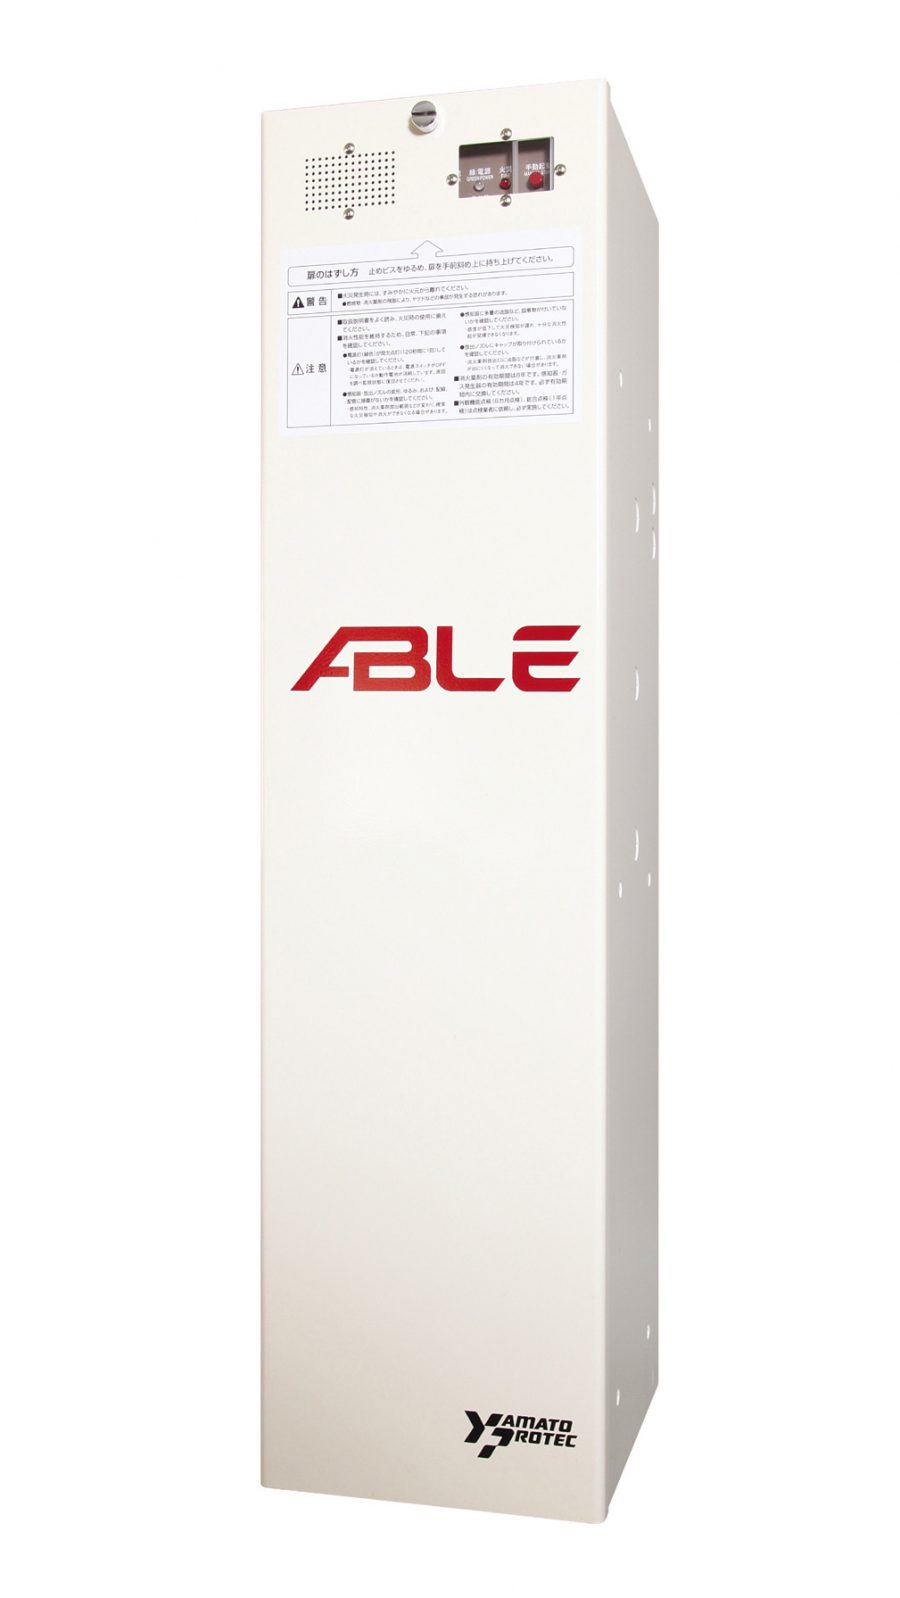 放電加工機用自動消火装置 エイブル